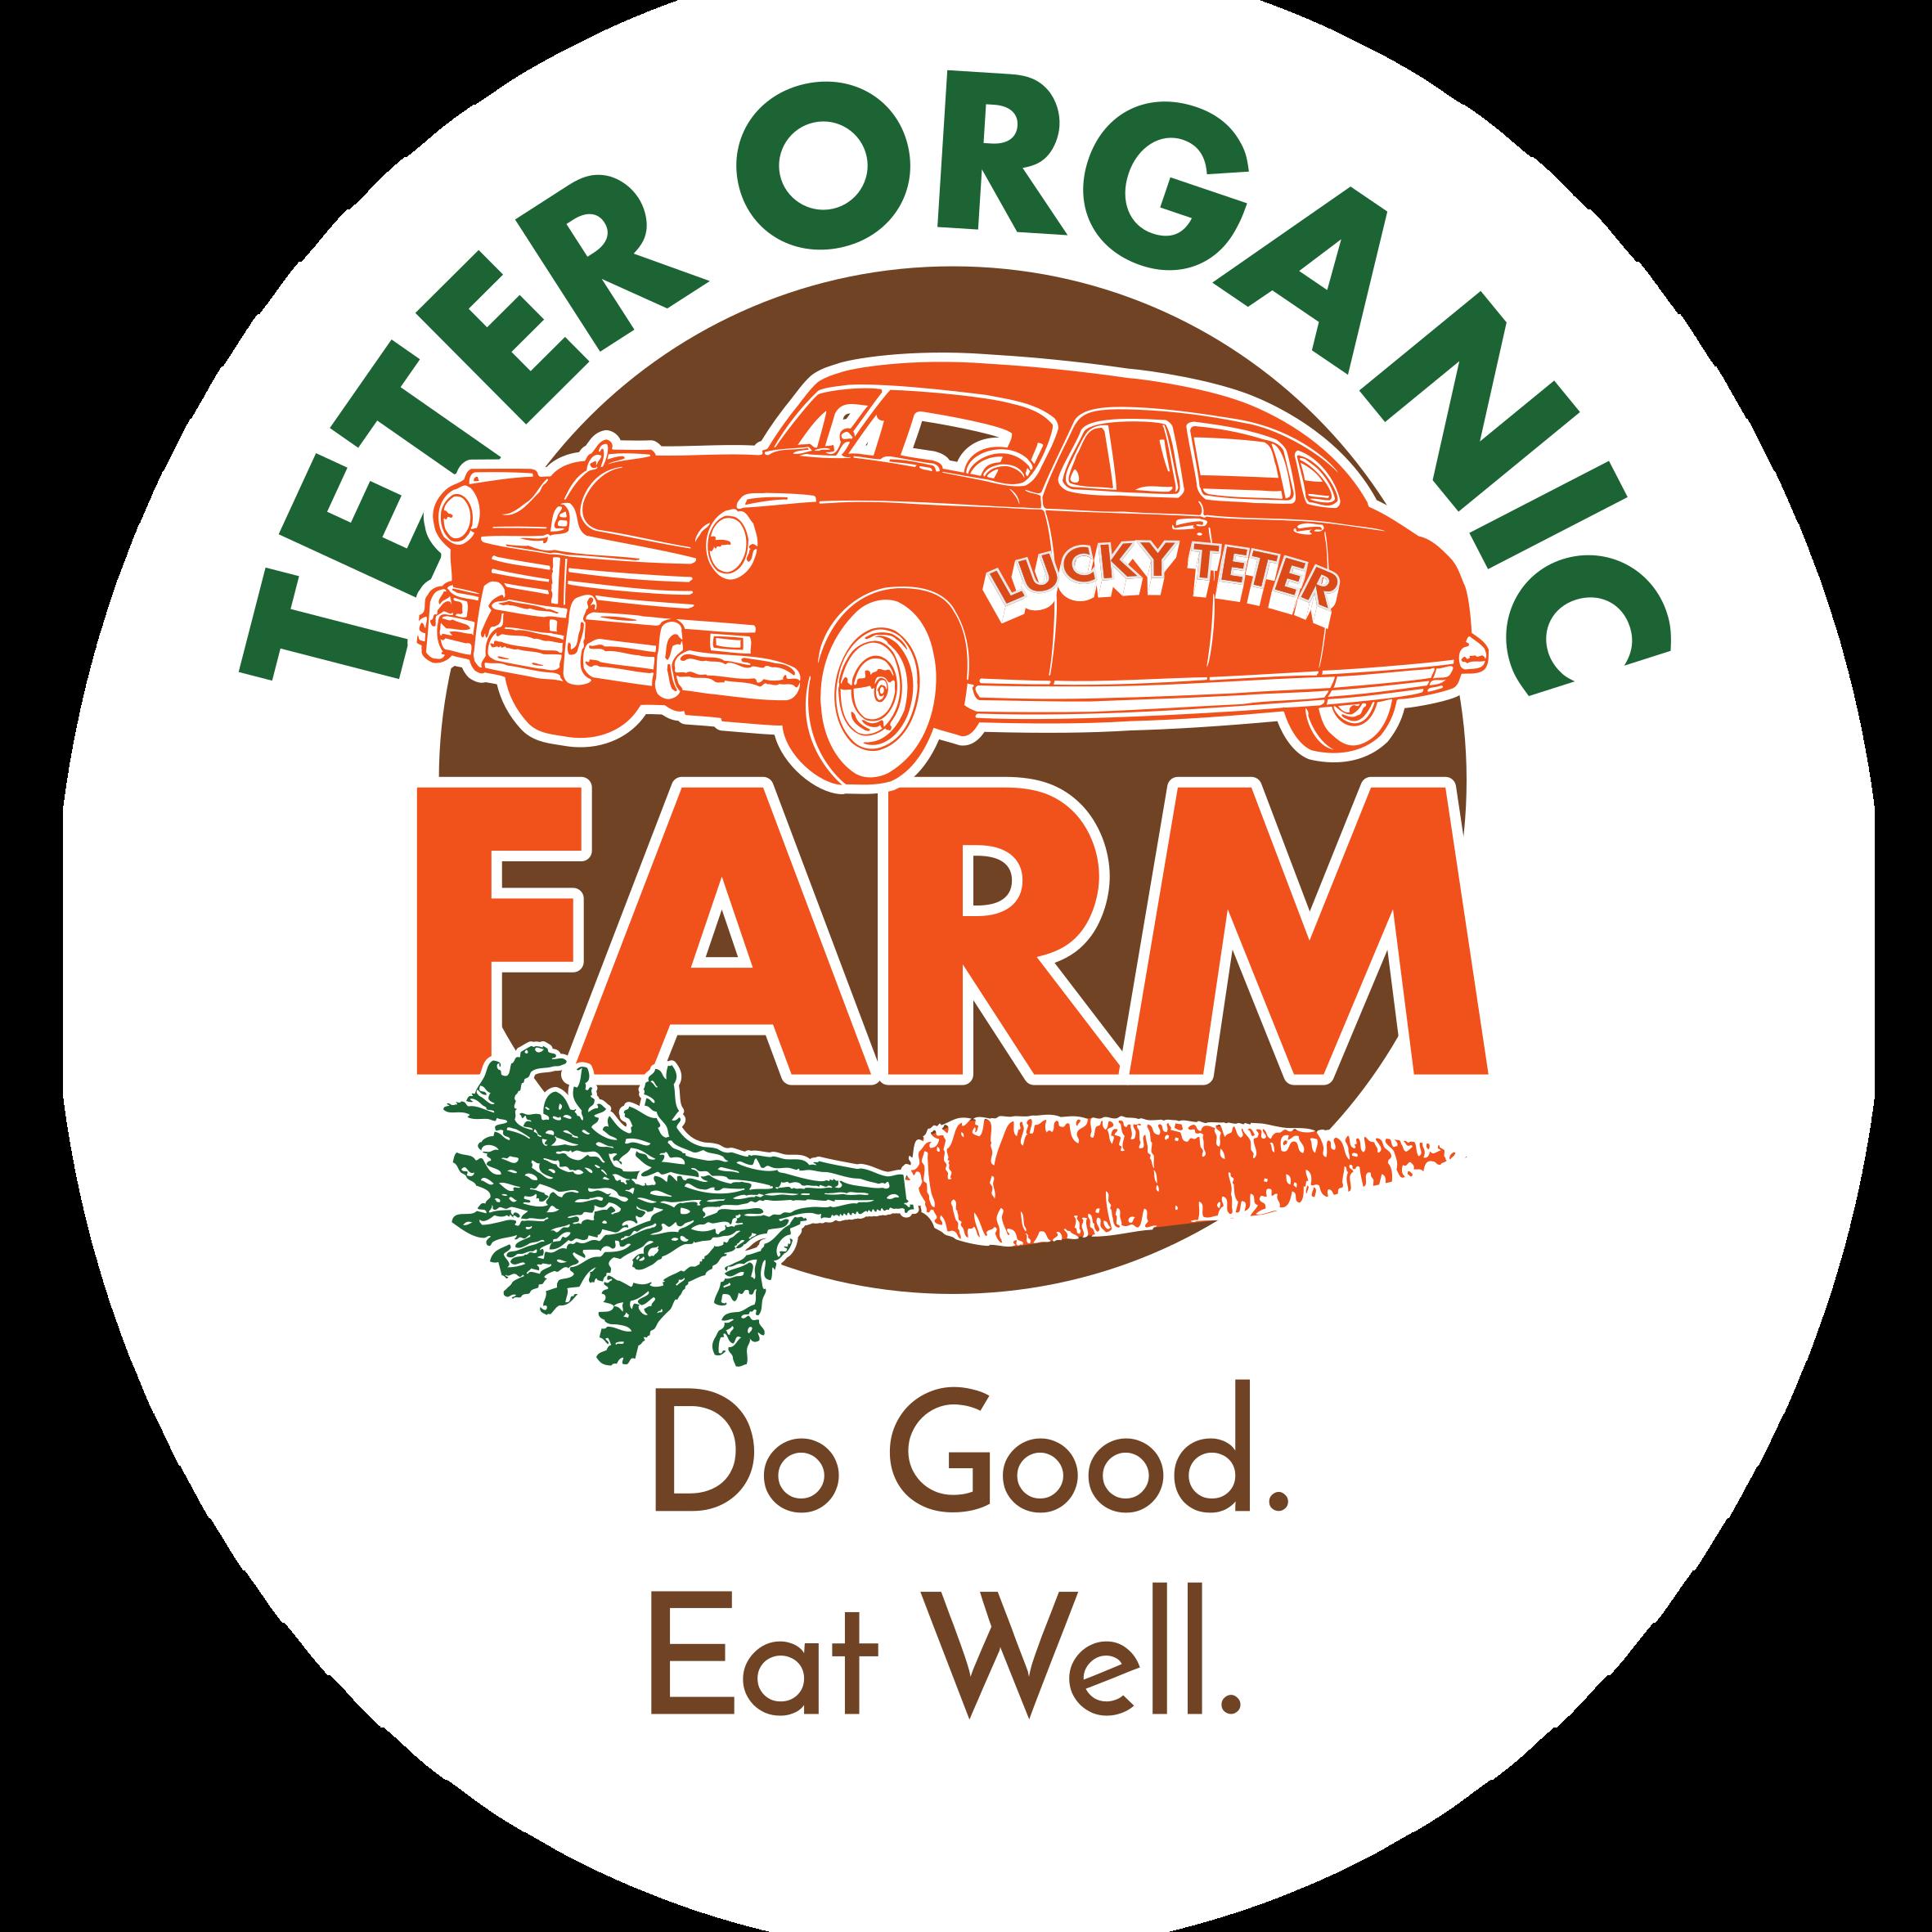 Teter Organic Farm